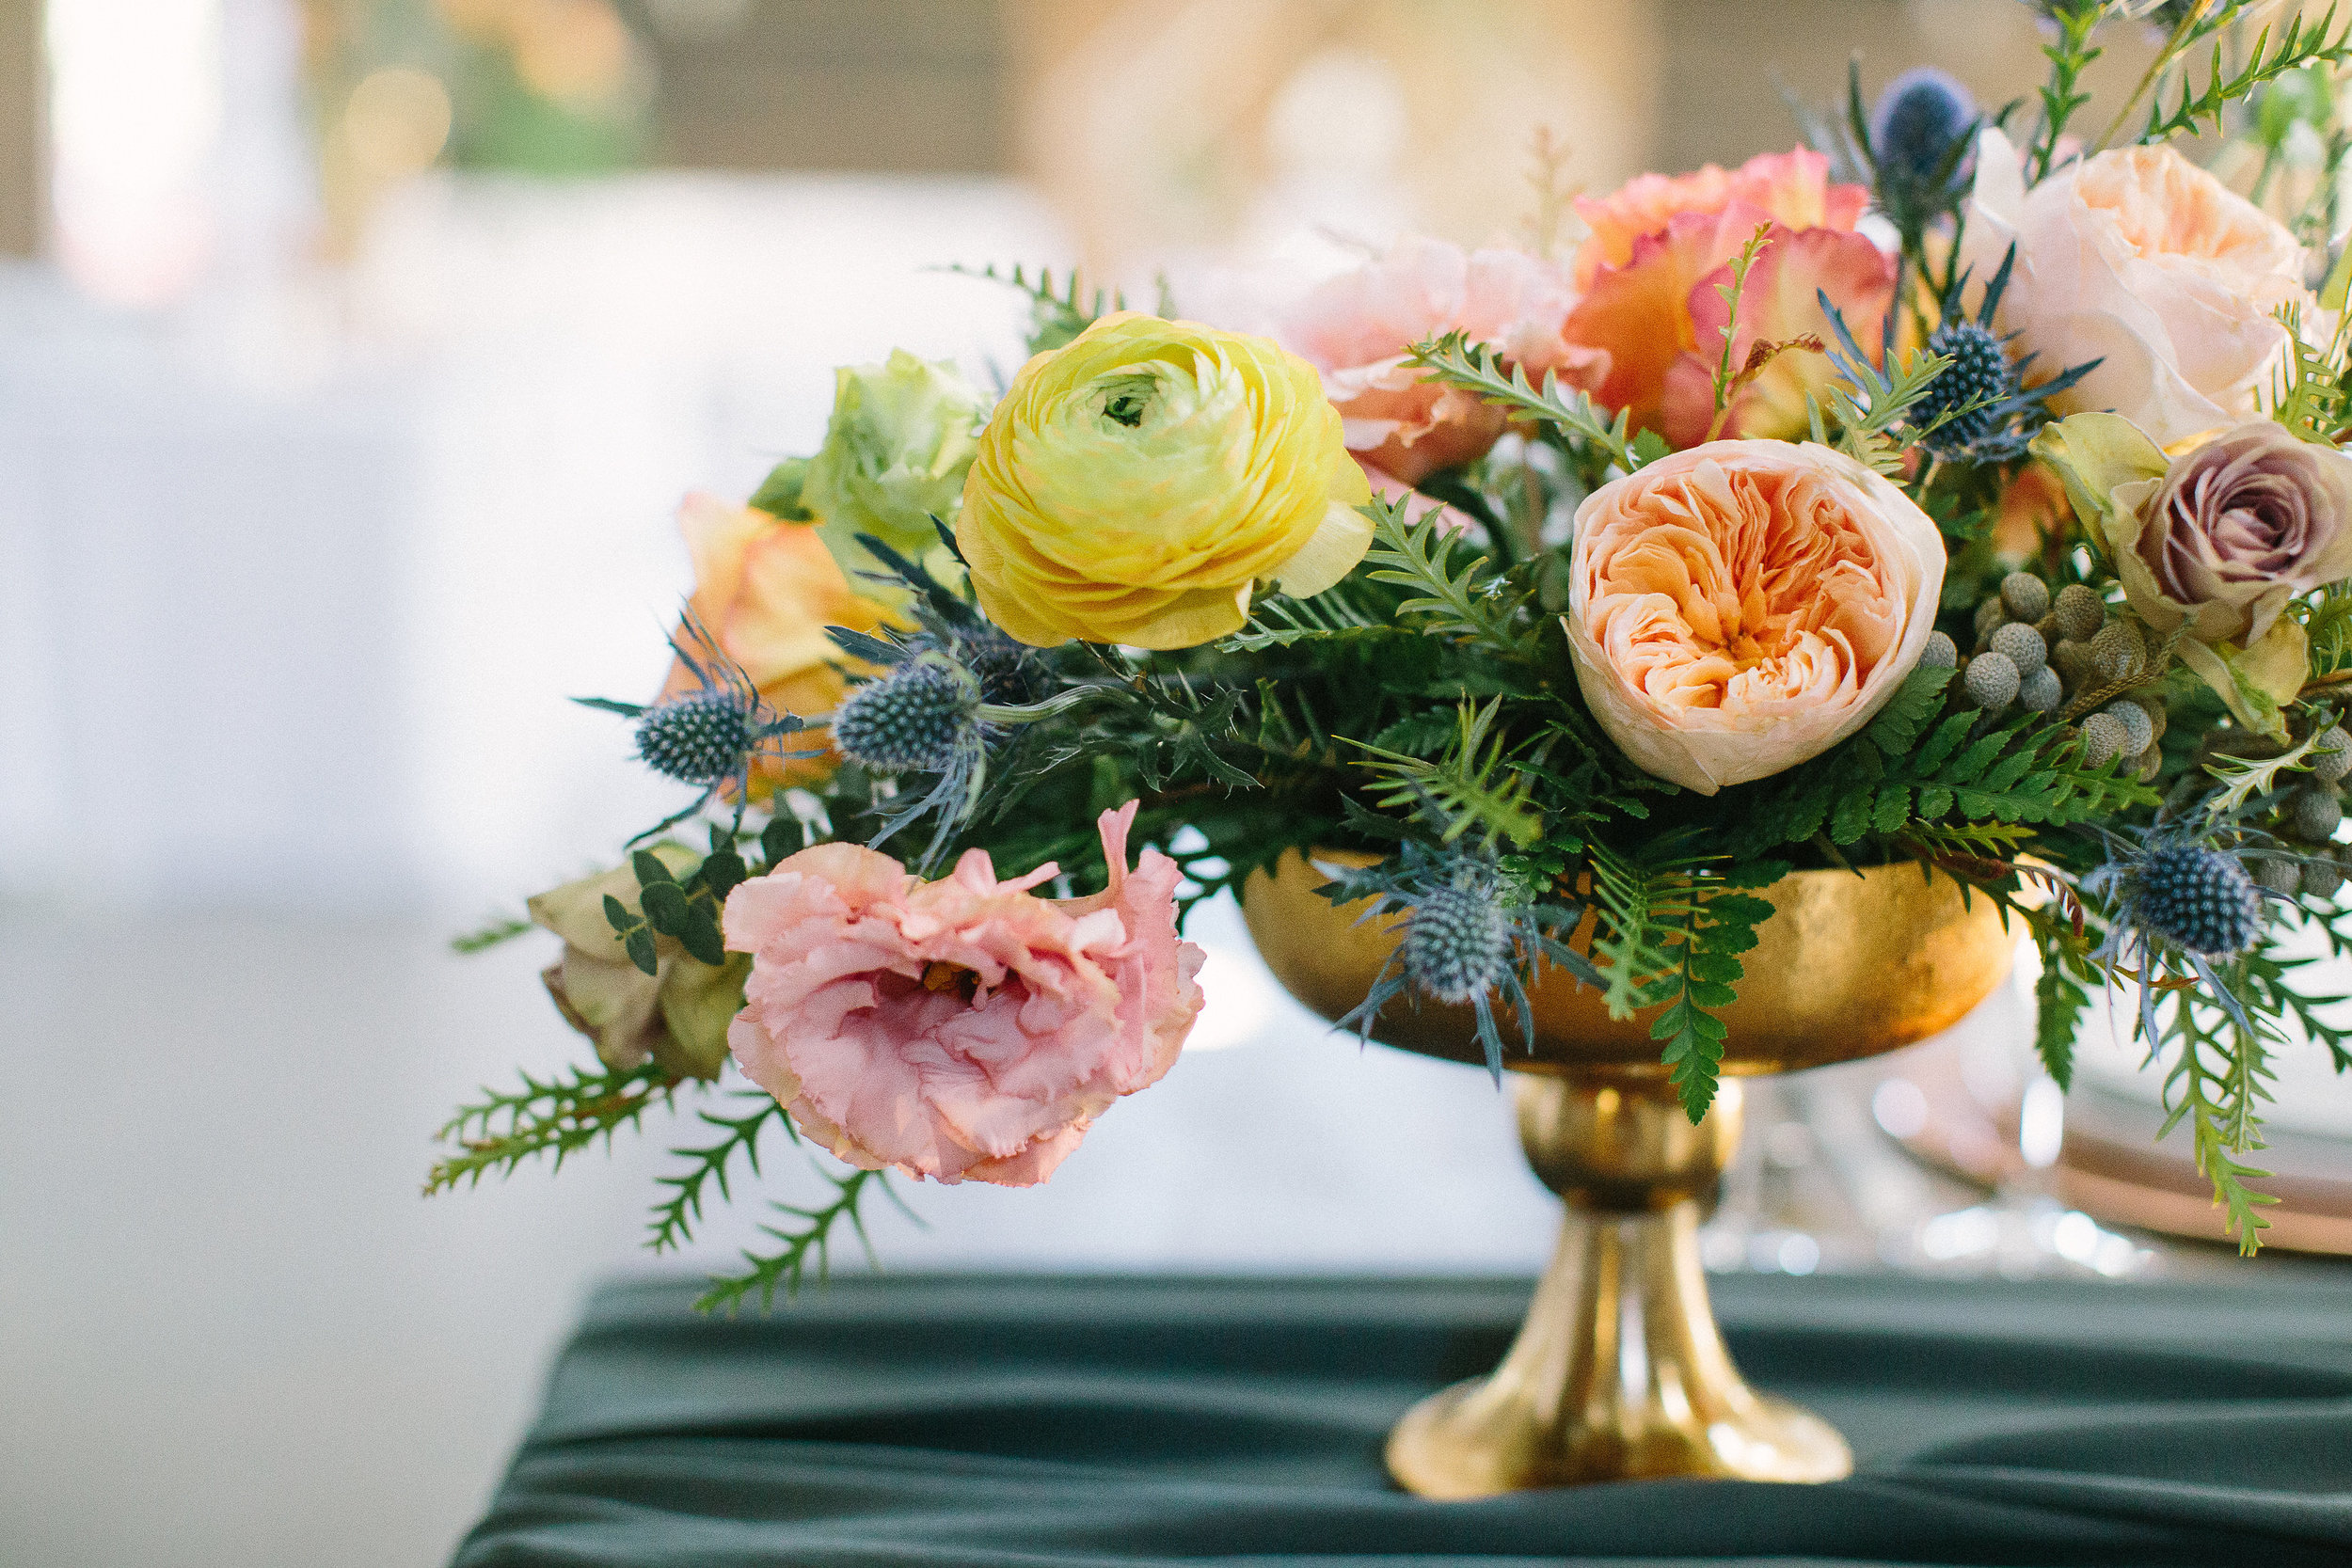 Ellen-Ashton-Photography-Peach-Creek-Ranch-Weddings-Wed-and-Prosper70.jpg